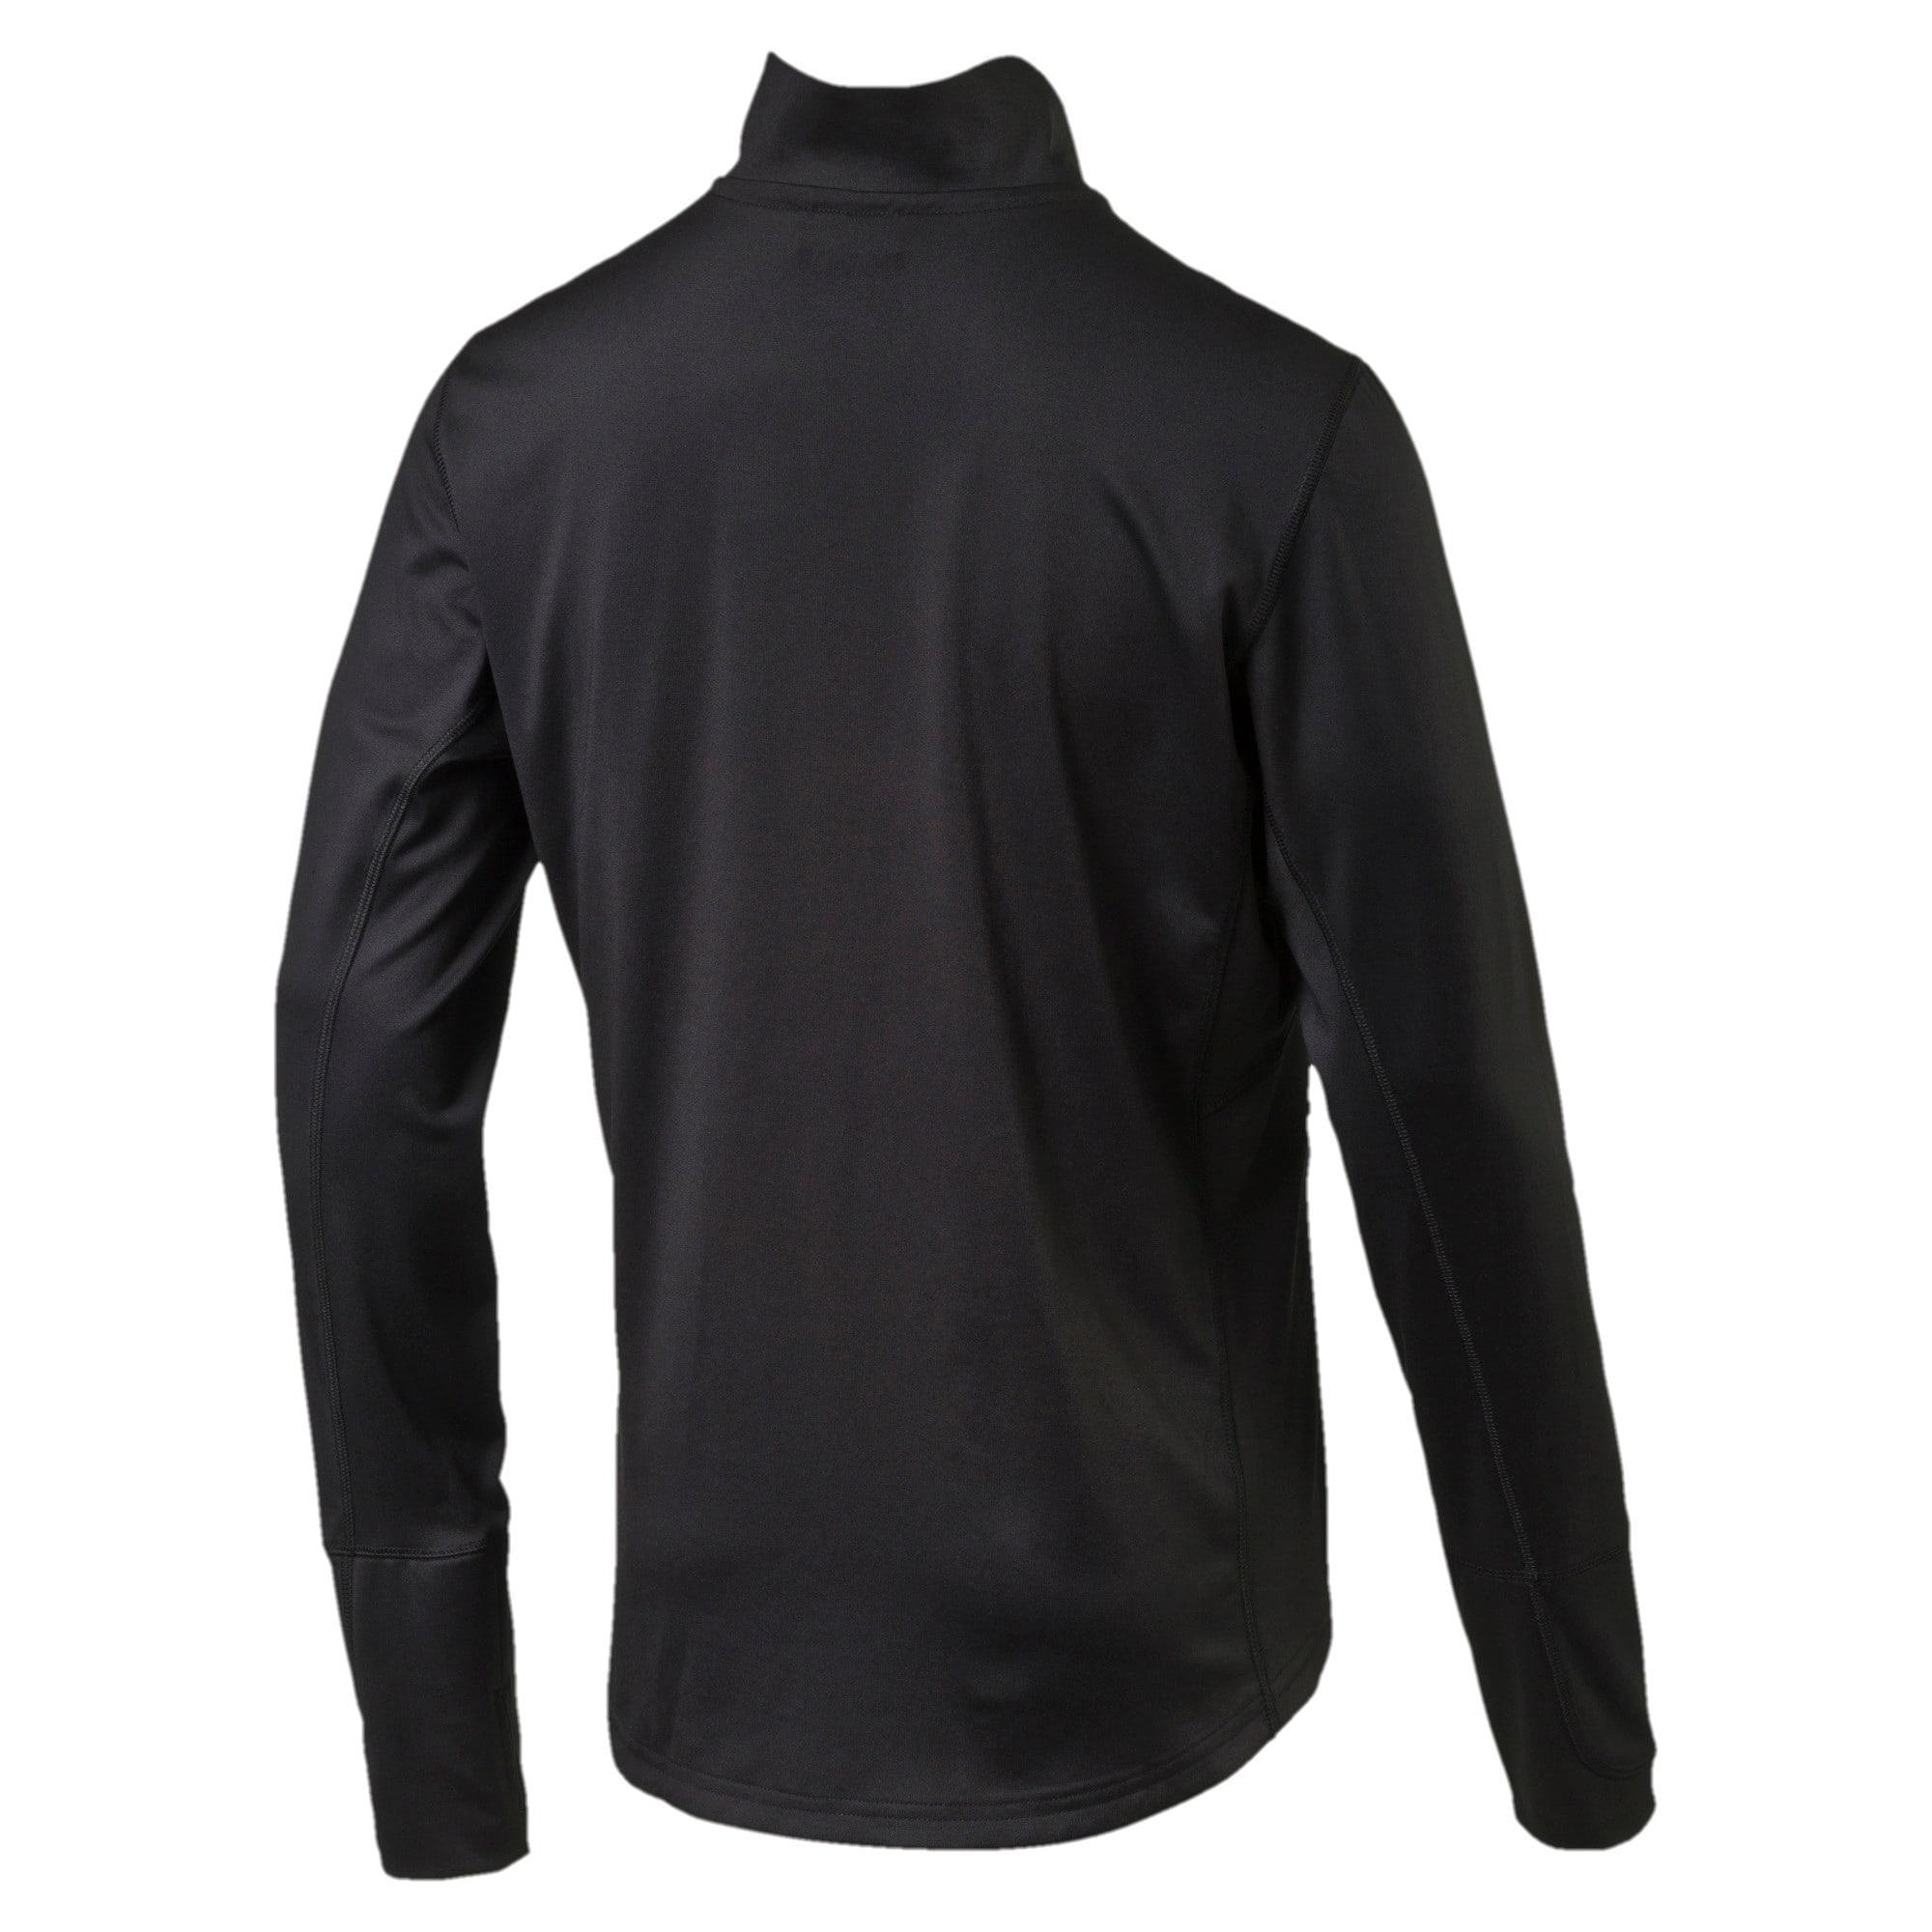 Thumbnail 5 of Running PWRWARM Men's Padded Jacket, Puma Black, medium-IND